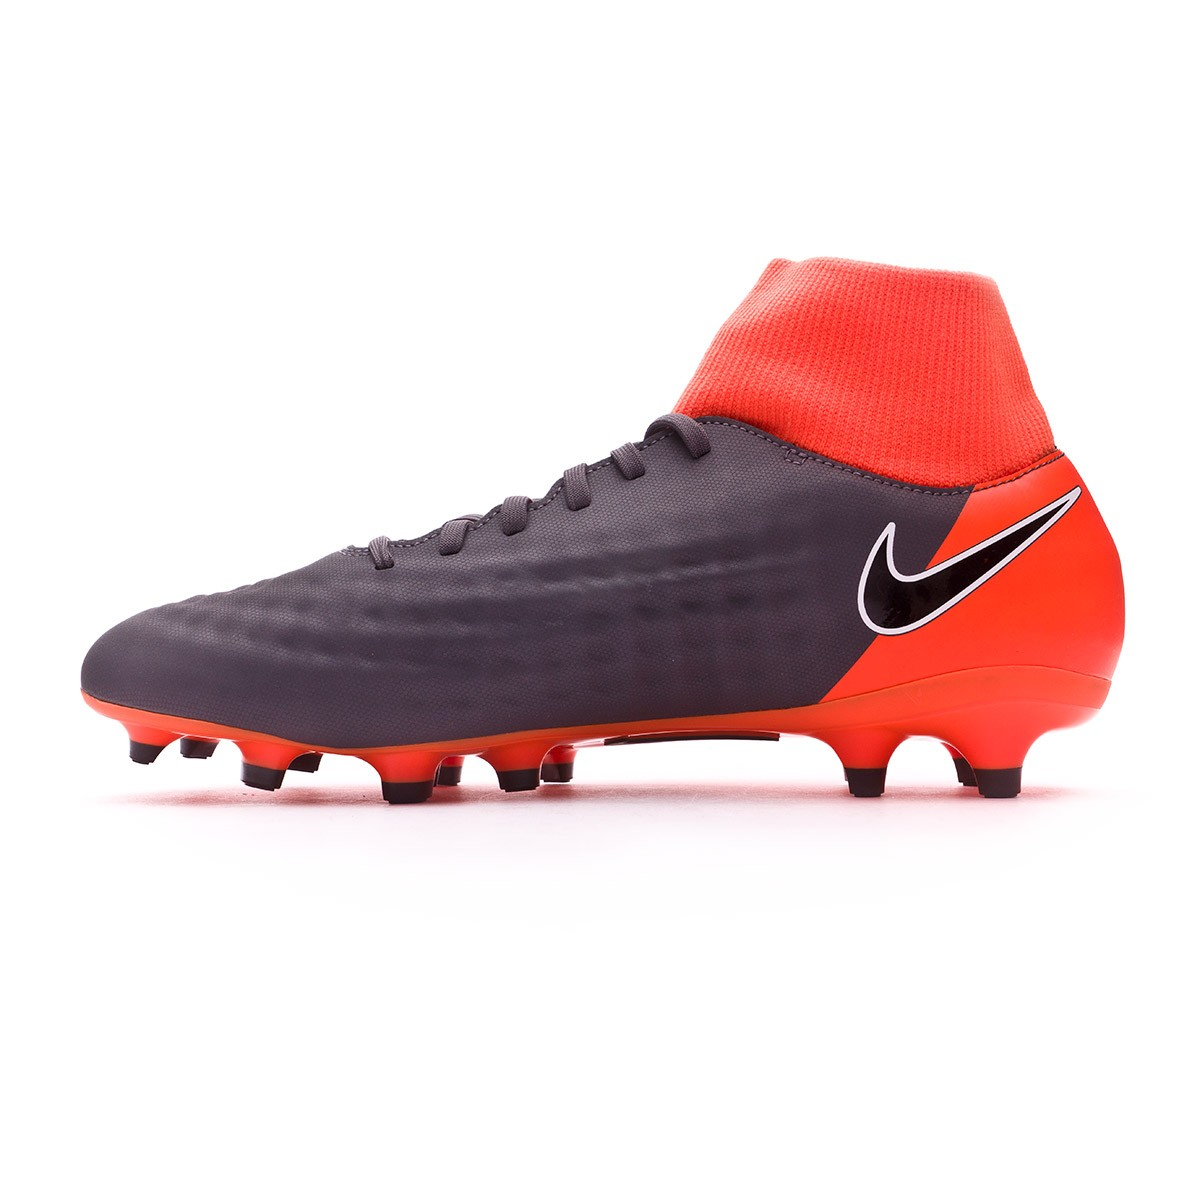 9f227208c9de Football Boots Nike Magista Obra II Academy DF FG Dark grey-Black-Total  orange-White - Tienda de fútbol Fútbol Emotion